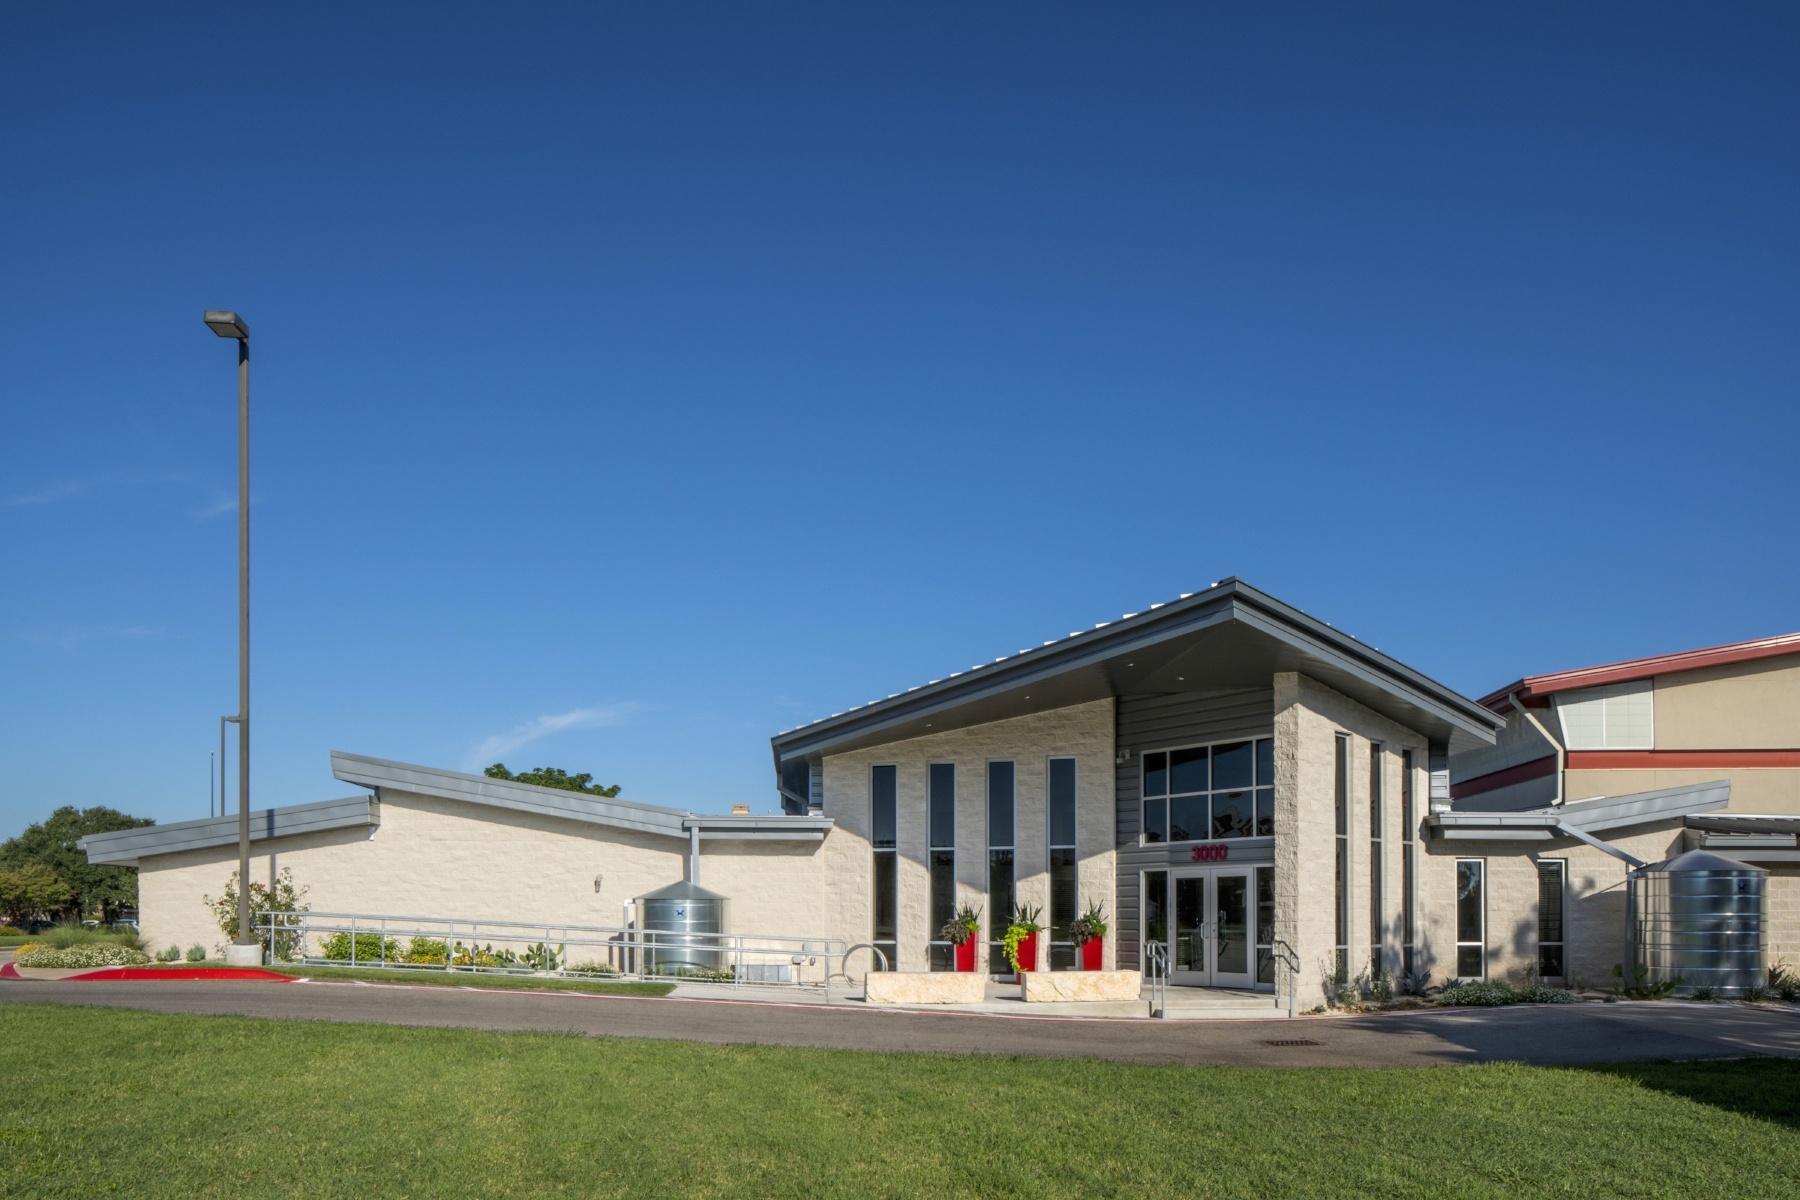 Wells Branch MUD Recreation Center Overal-793319-edited.jpg